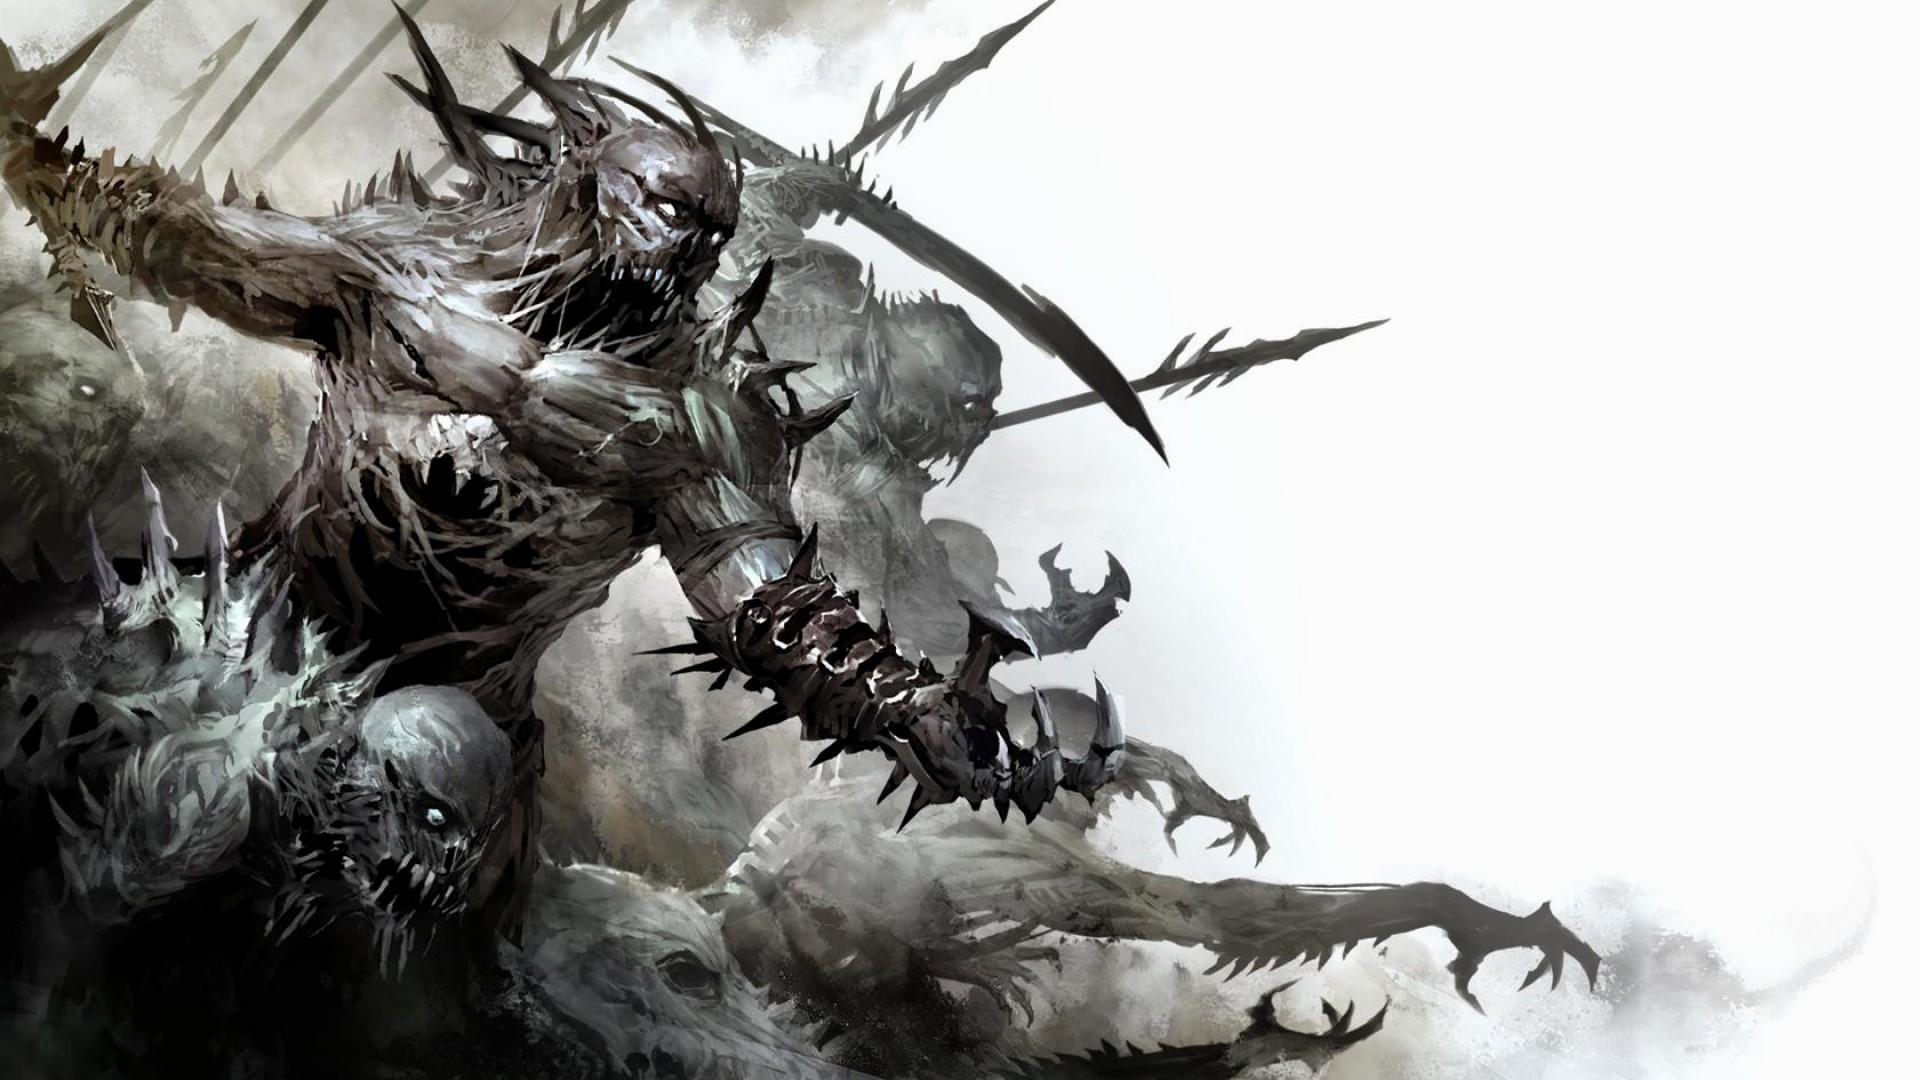 Demons wallpaper wallpapertag - Demon wallpaper 4k ...